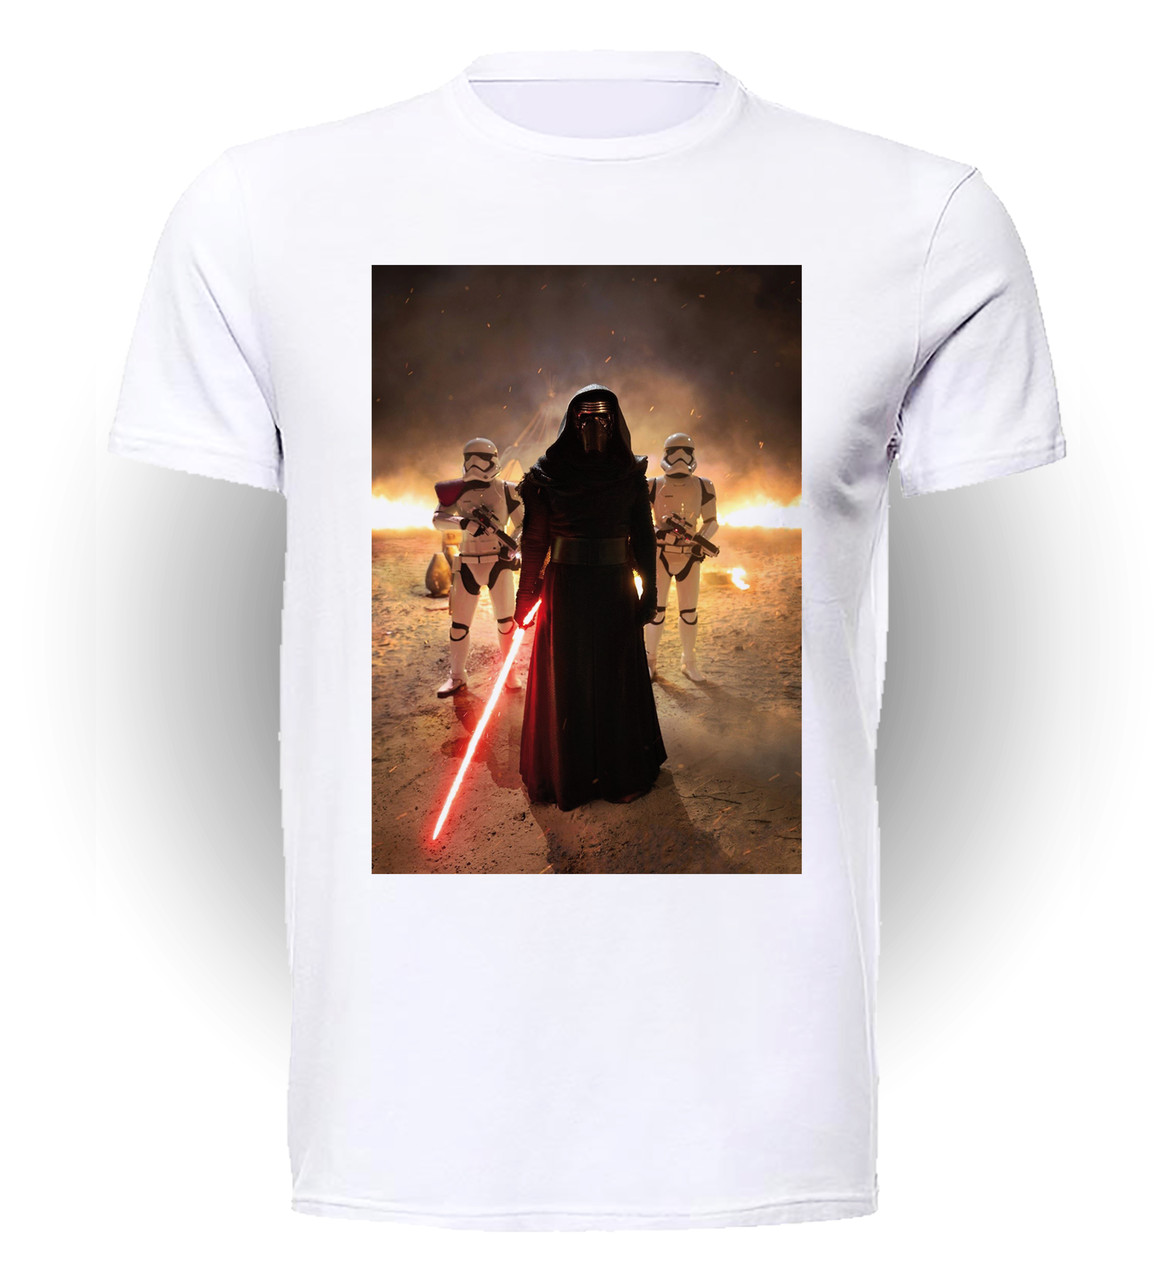 Футболка GeekLand Звёздные войны Star Wars aфиша SW.01.009